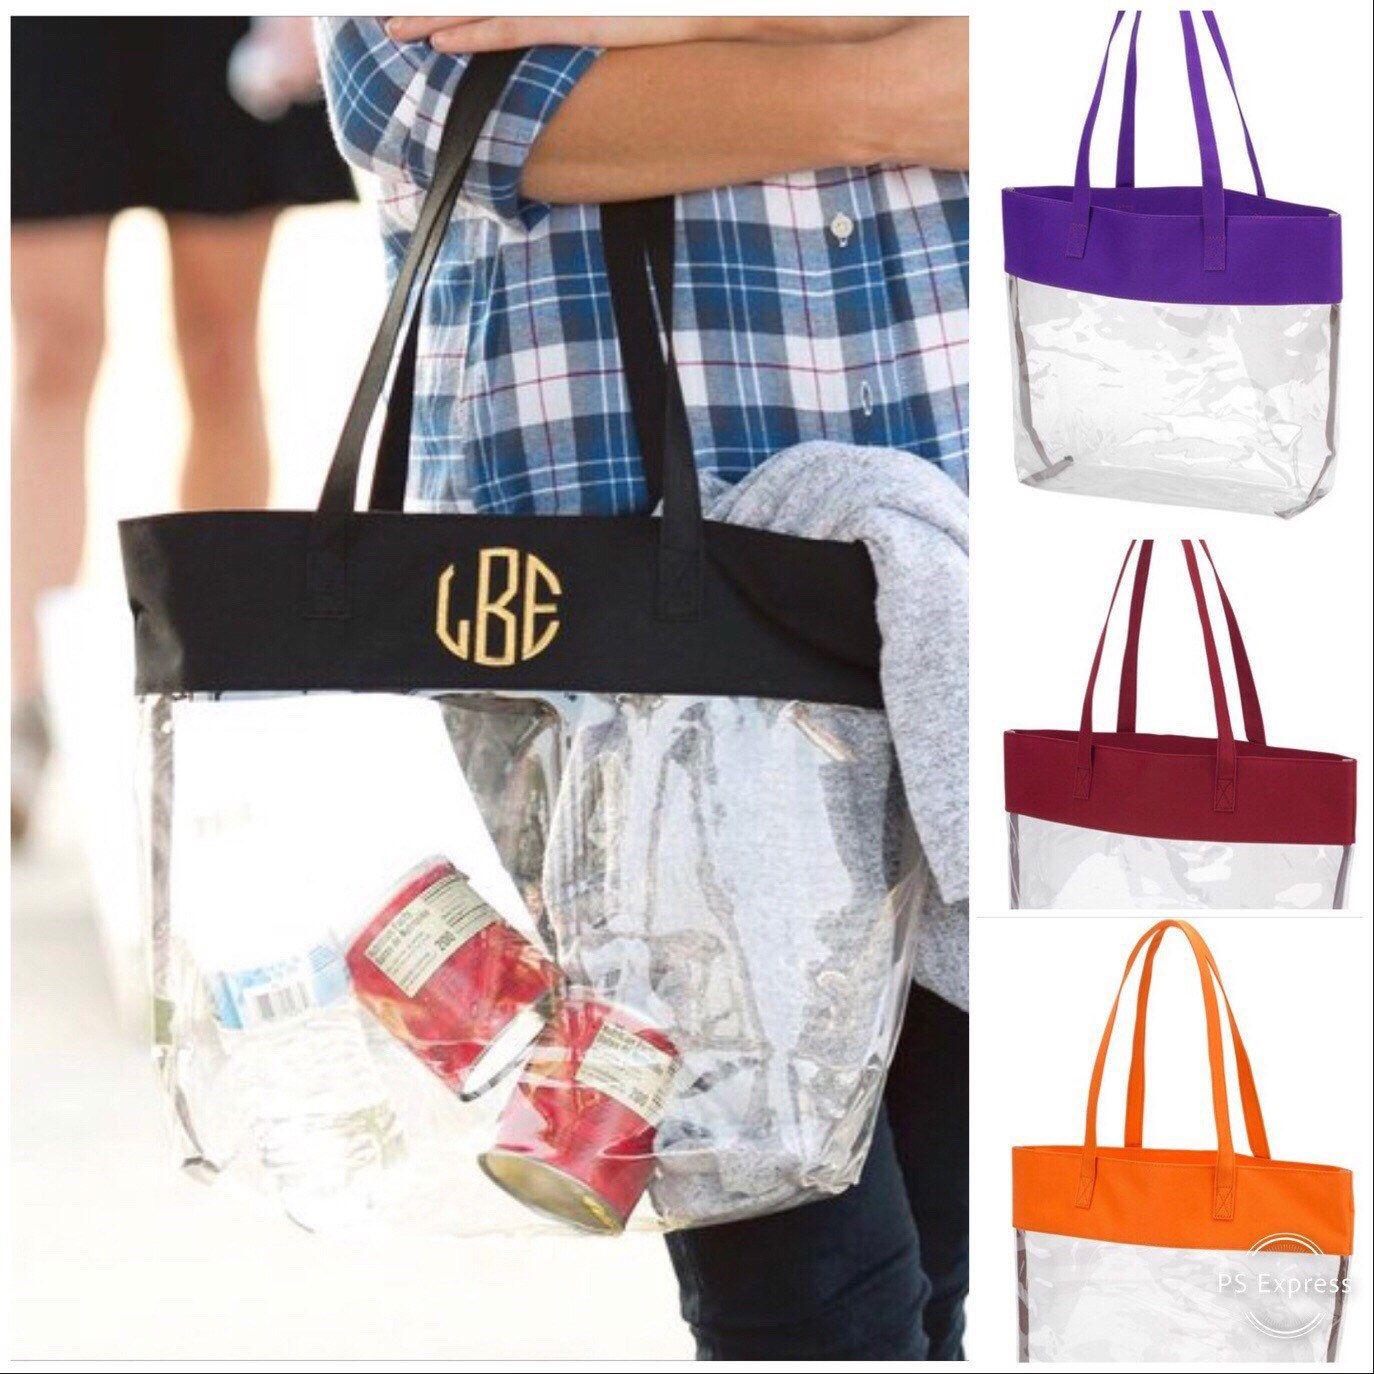 Sporting Event Clear Purse Stadium Tote Festival Policy Bag Festival Gift Idea Monogram Clear Stadium Purse Crossbody Bag